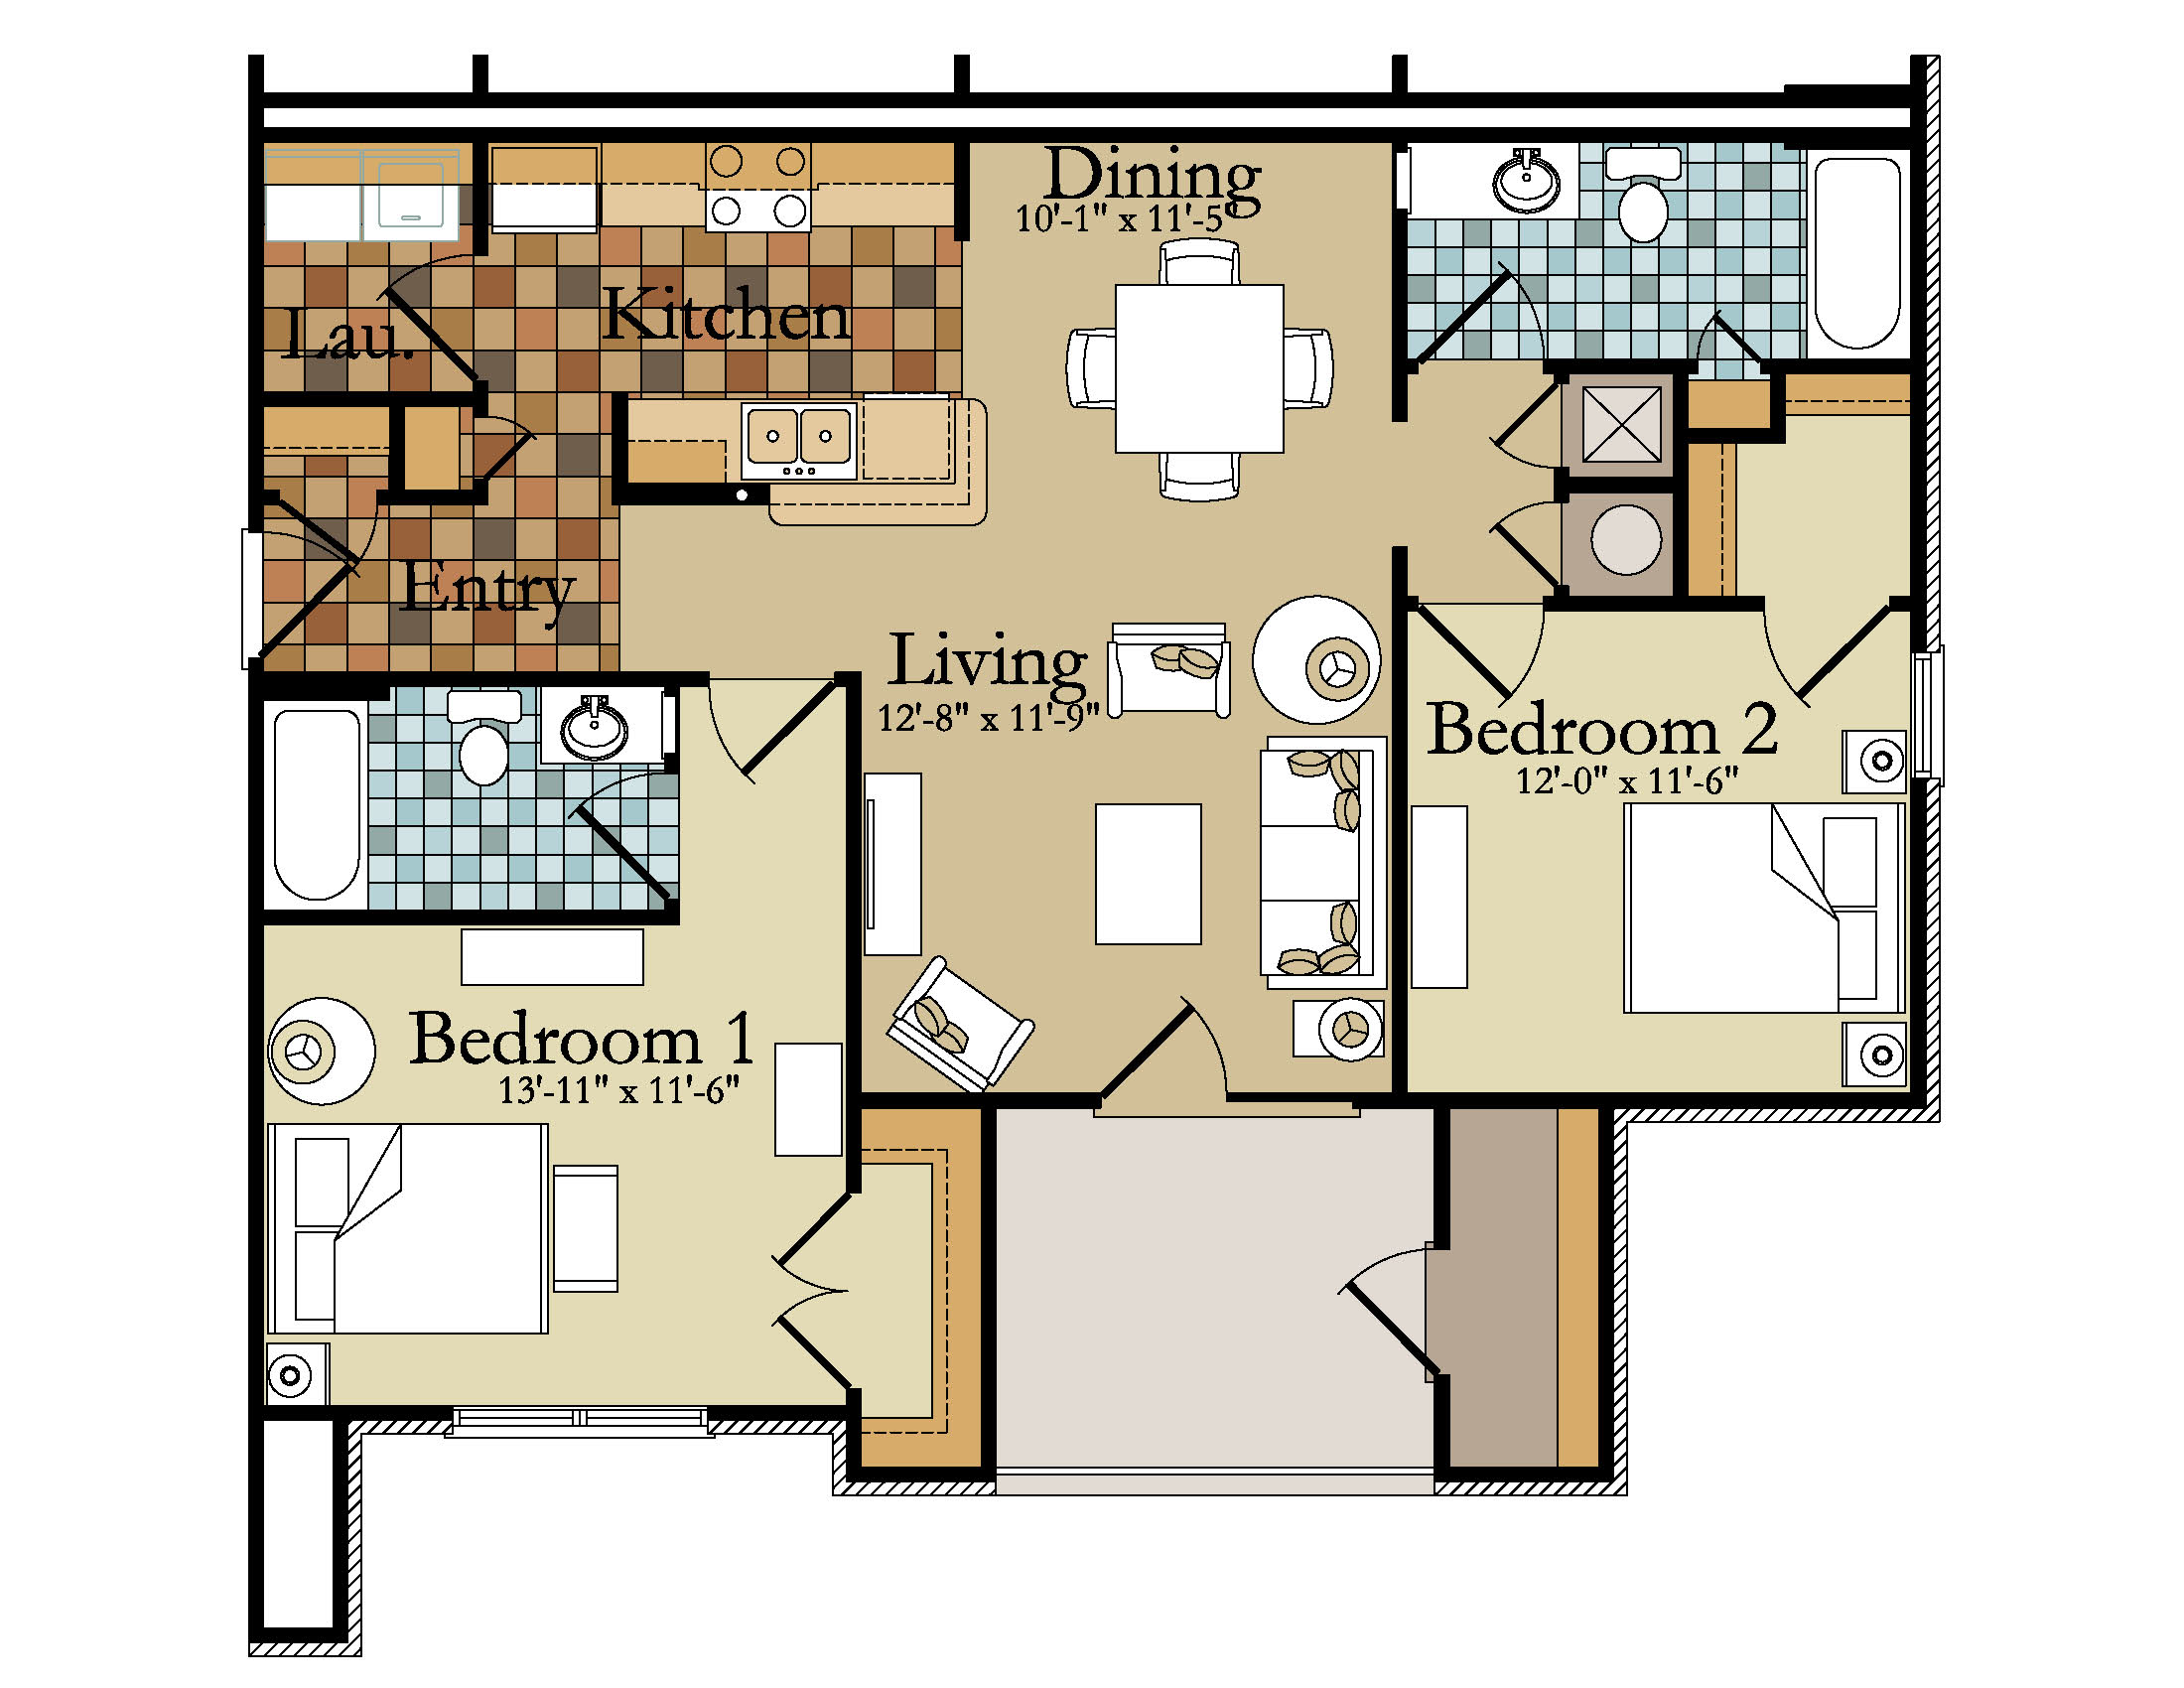 Greystone Homes Az Floorplans Home Review